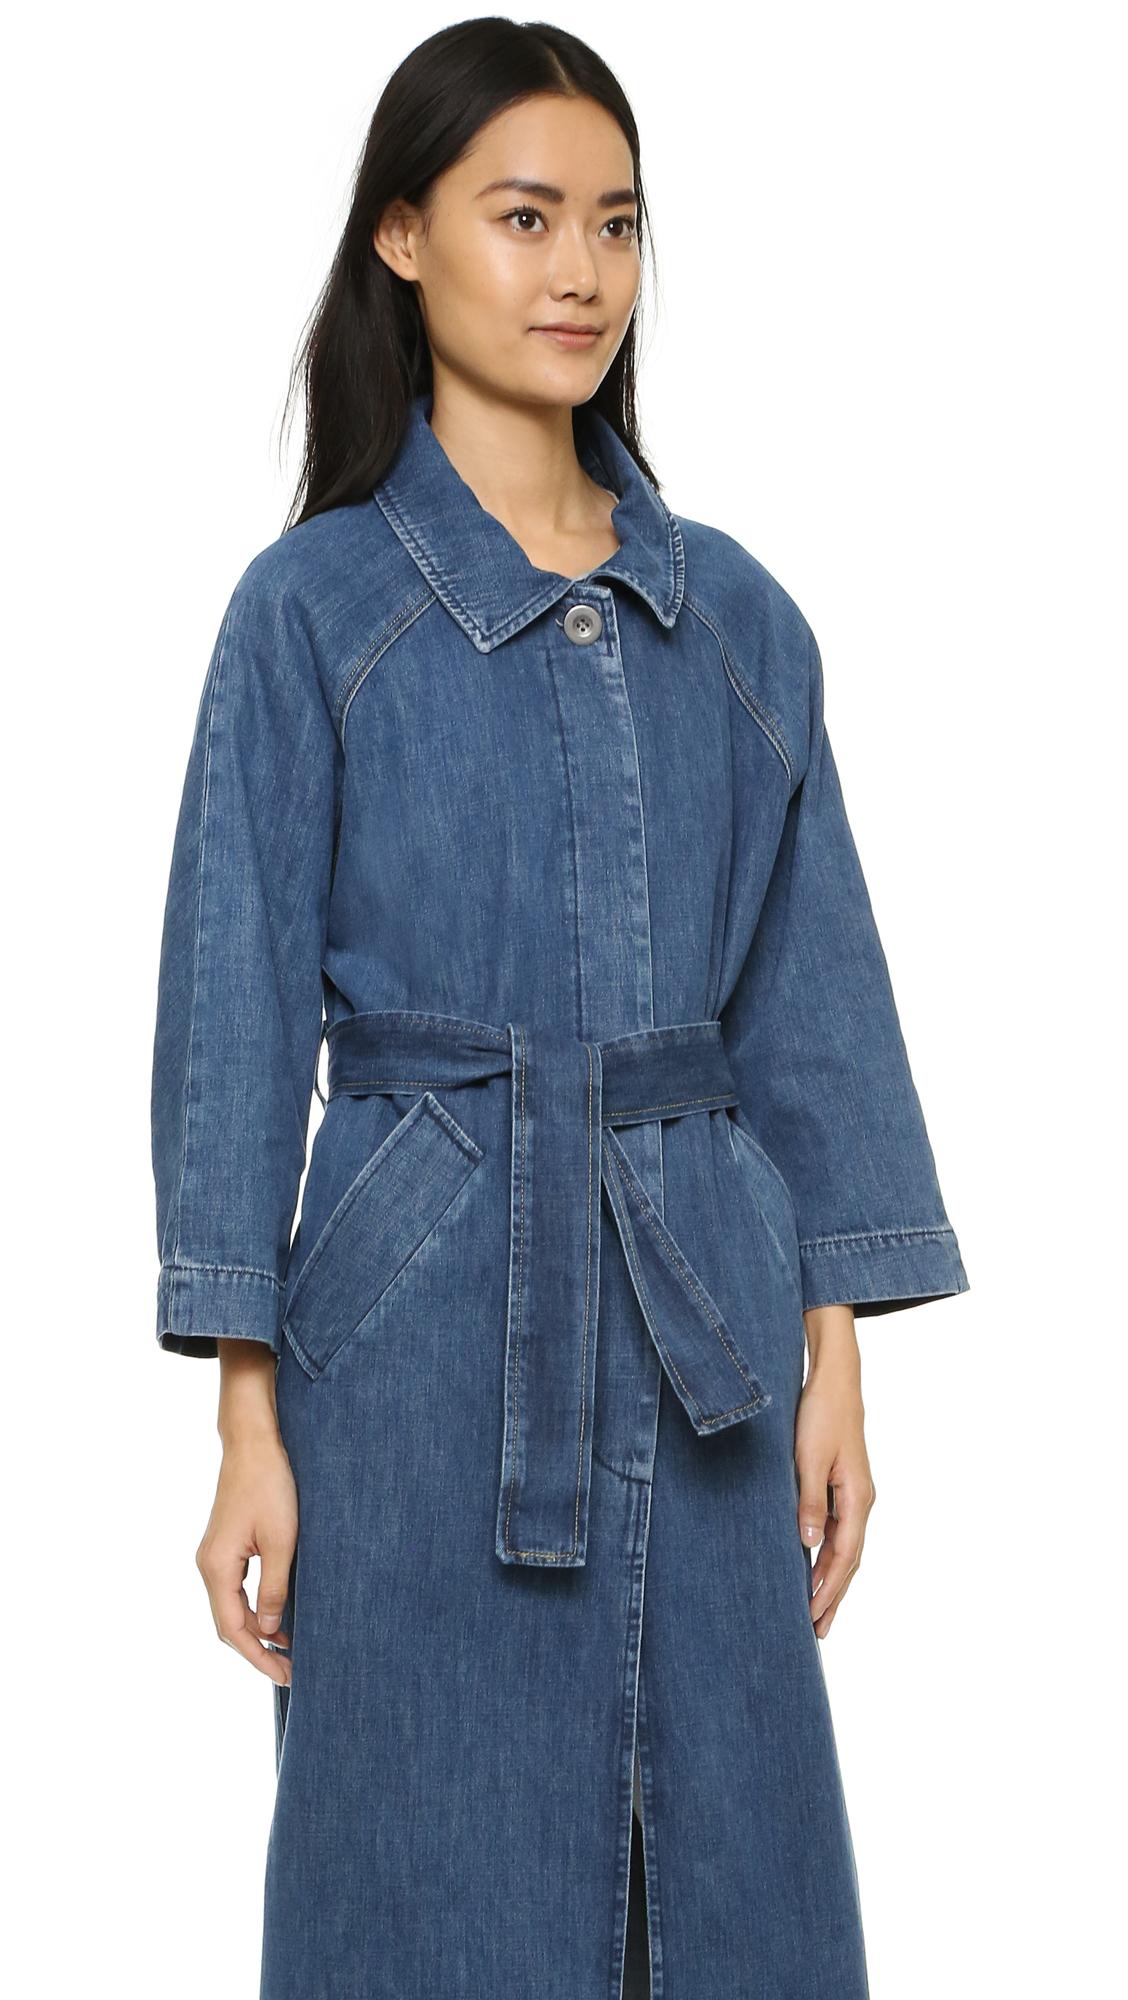 Lyst - M.I.H Jeans Raglan Denim Coat in Blue